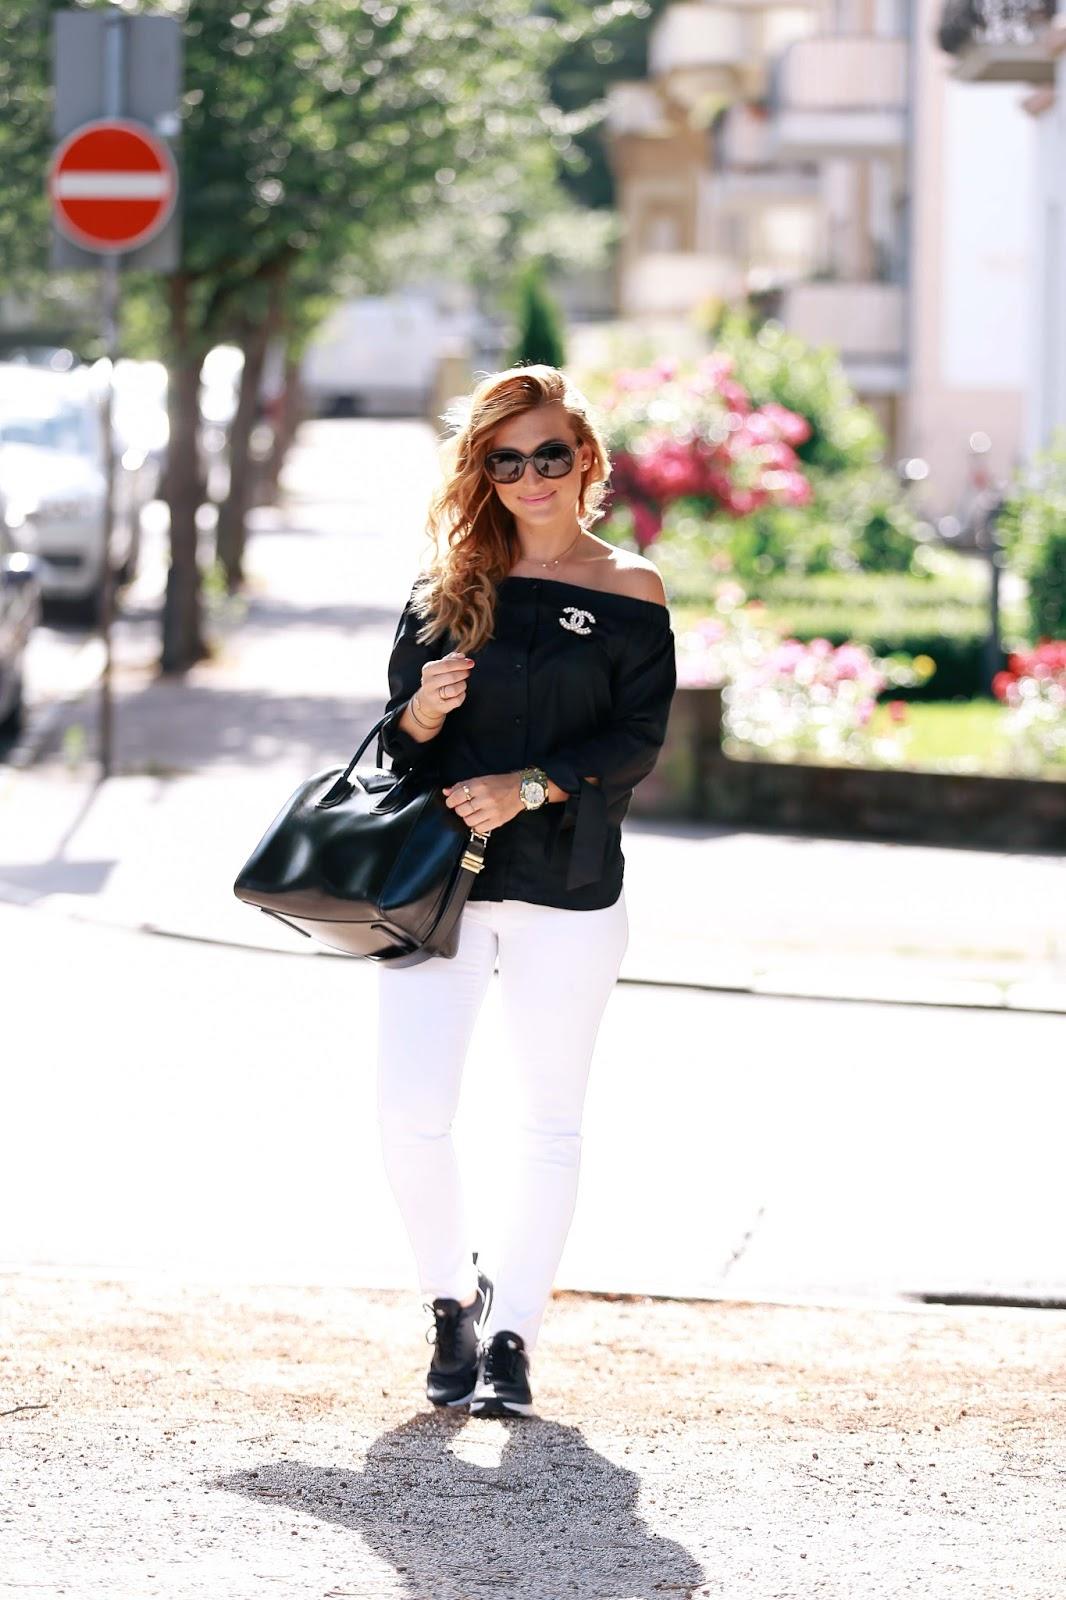 Fashionblogger mit sneakers-schick-casual-chanel-brosche-blogger-defshop-fashionstylebyjohanna